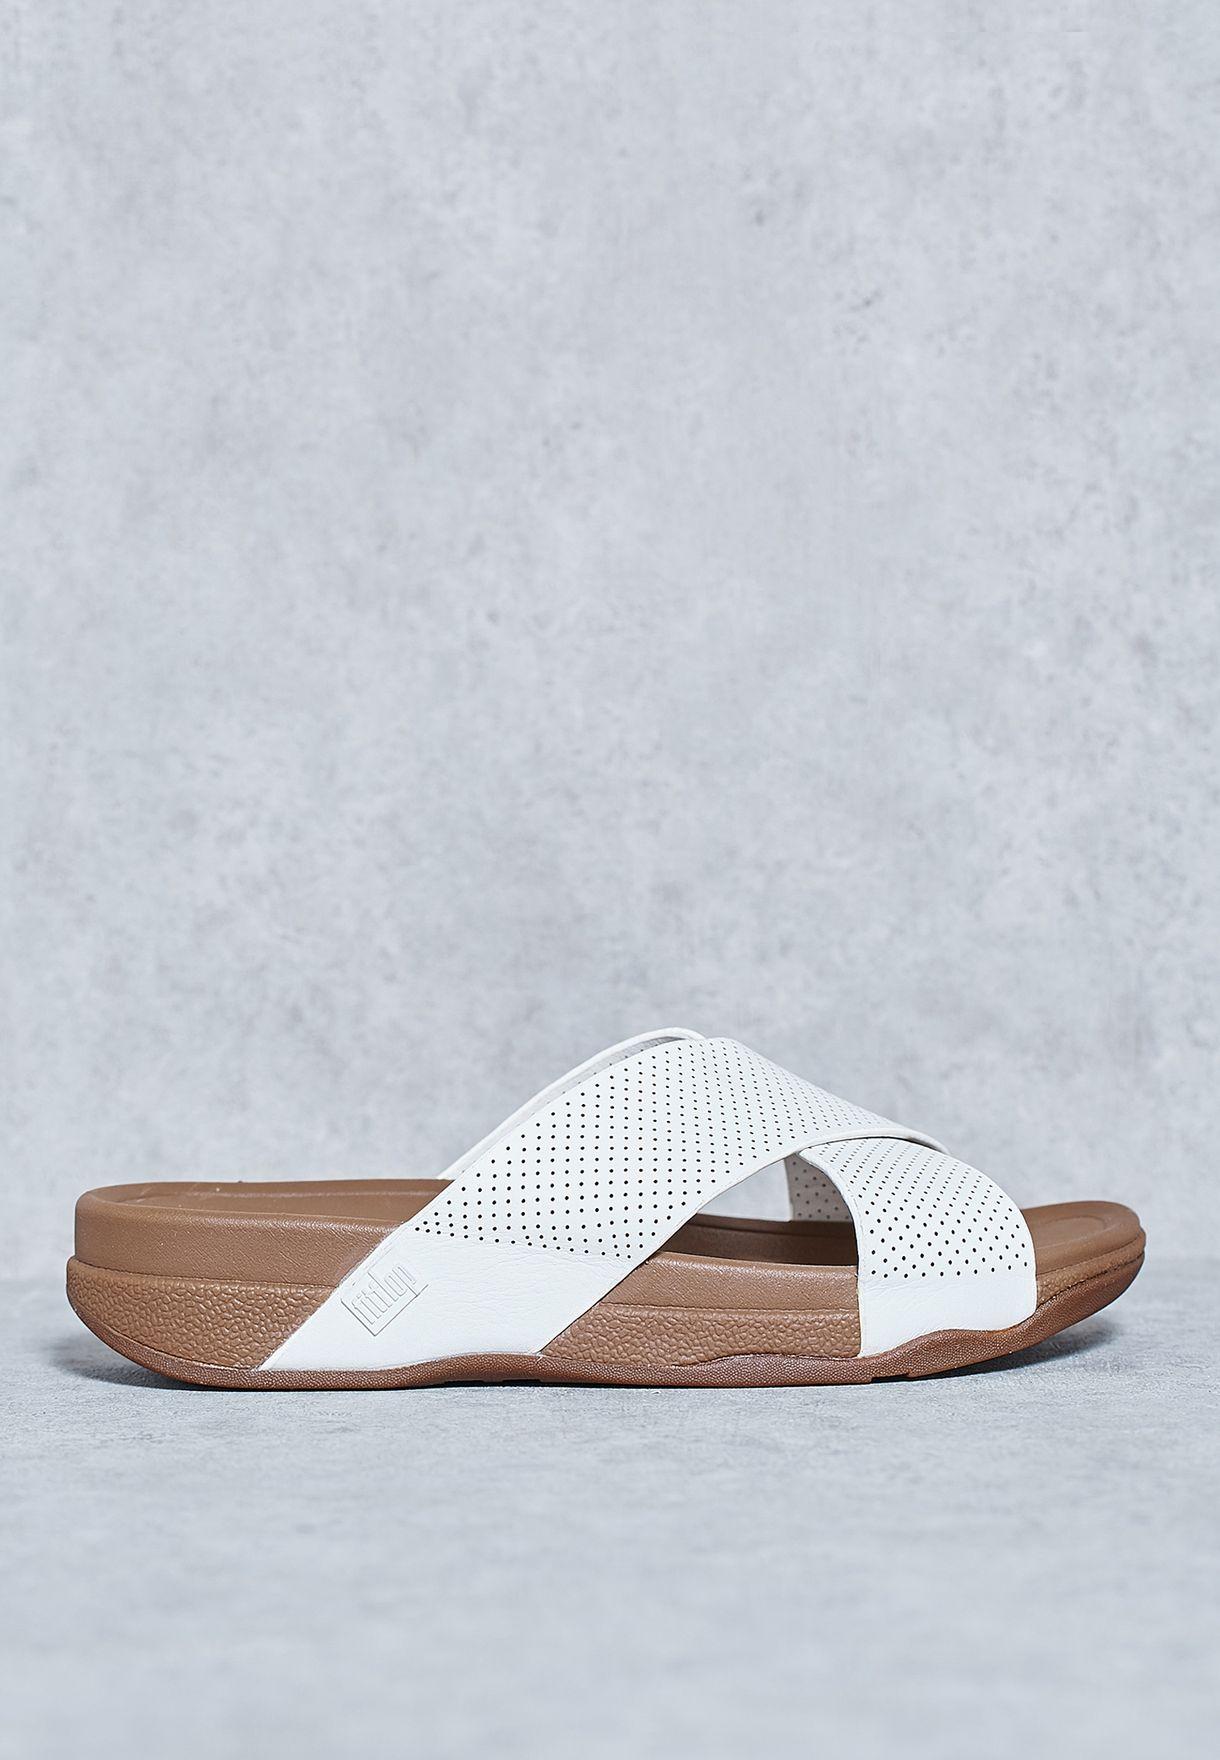 fe70ebe304a6 Shop Fitflop white Surfer Cross Slide Sandals C07-194 for Men in Saudi -  FI008SH16FZR